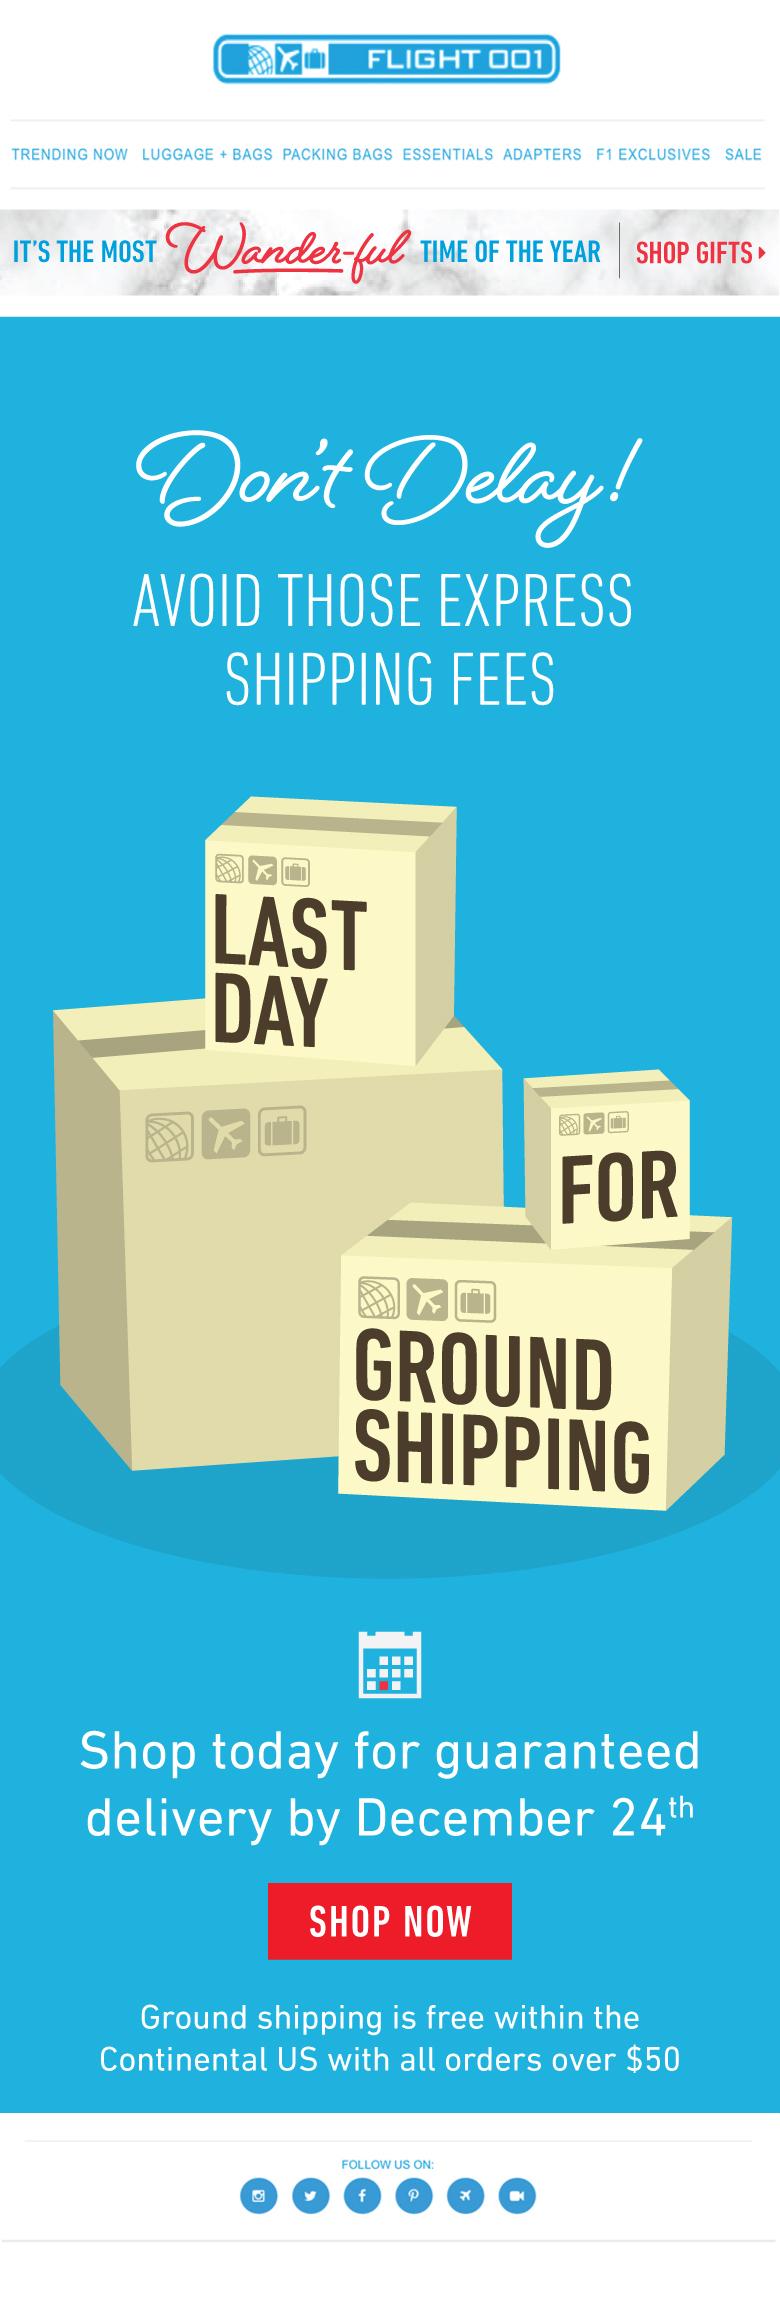 181214-Last-Day-Ground-Shipping.jpg